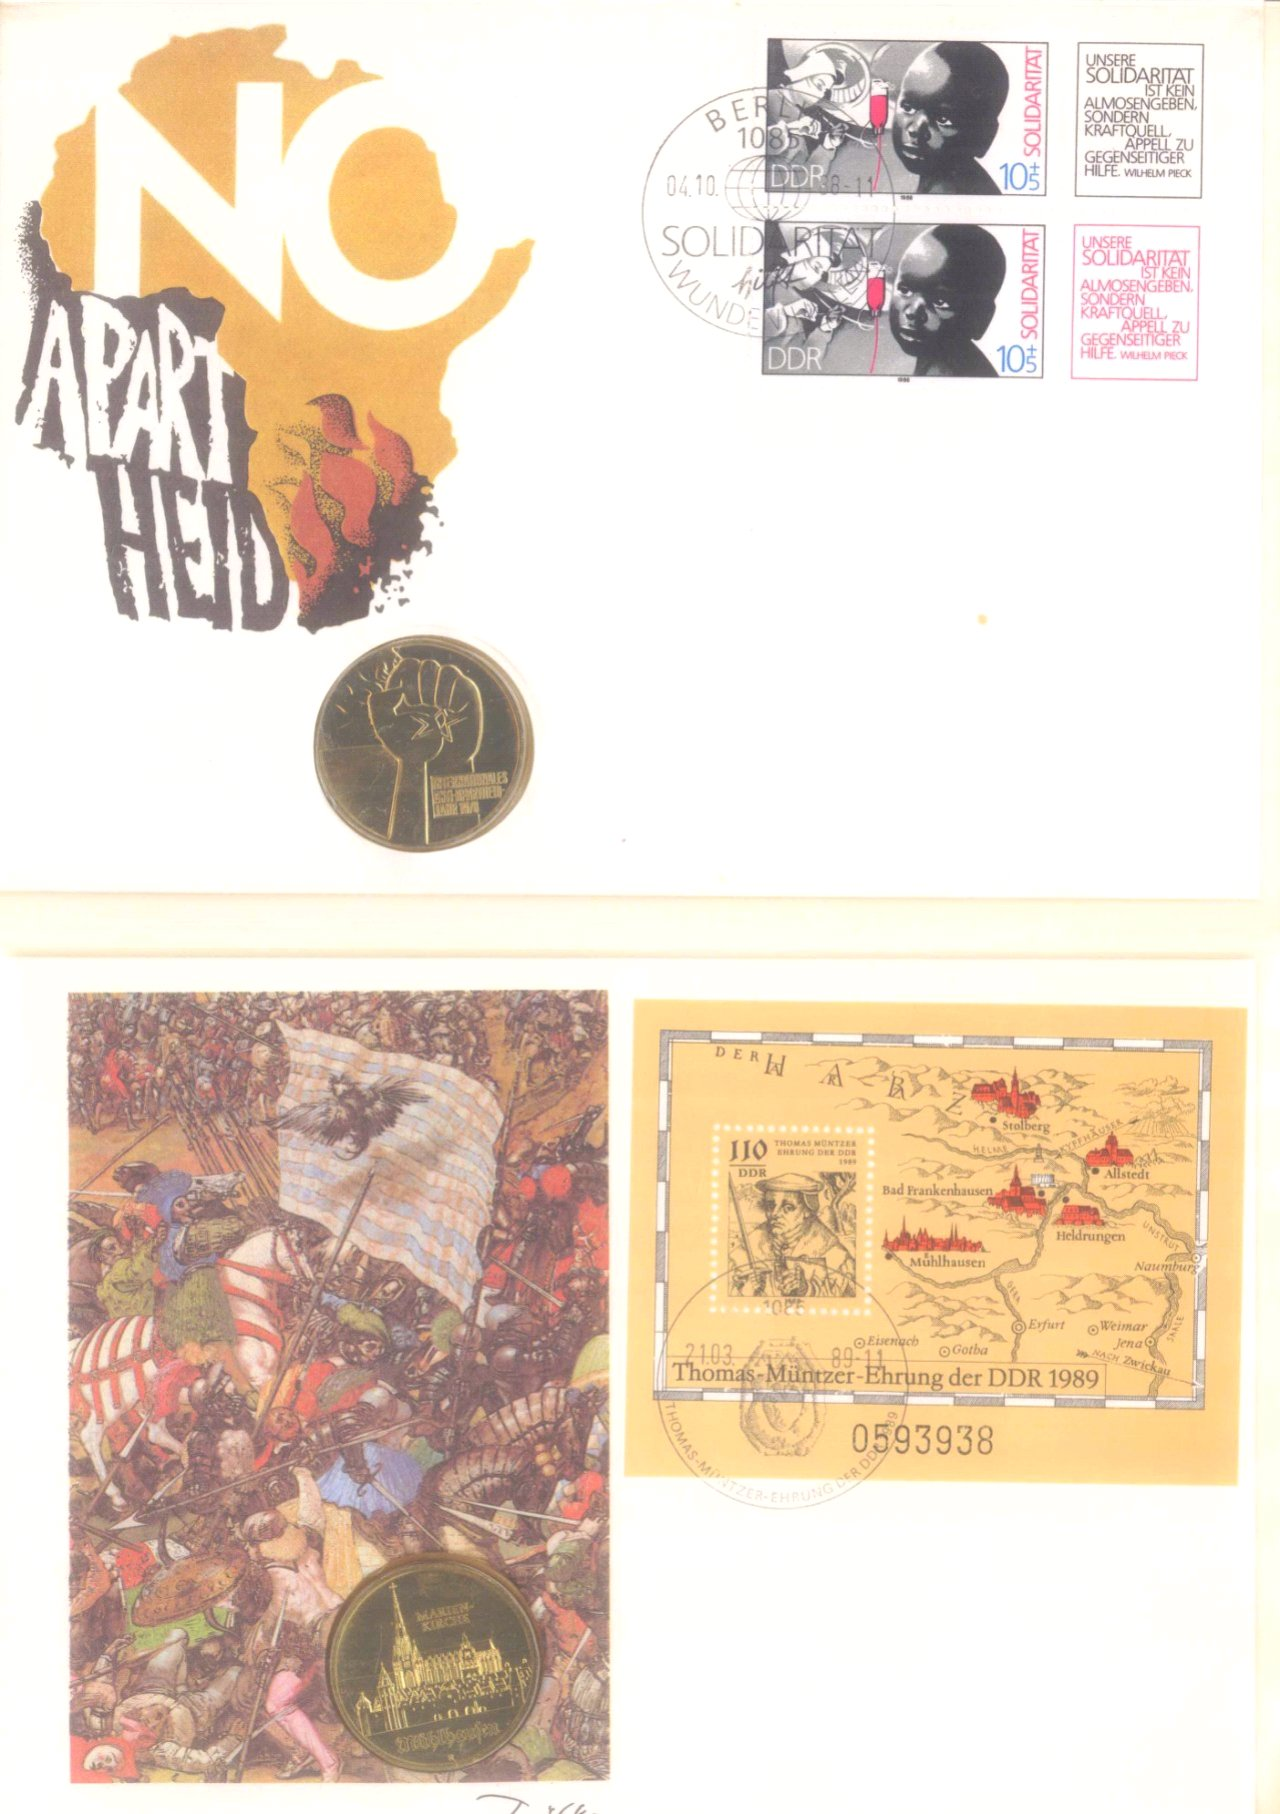 Sammlung Borek Numisbriefe im Ringbinder-8